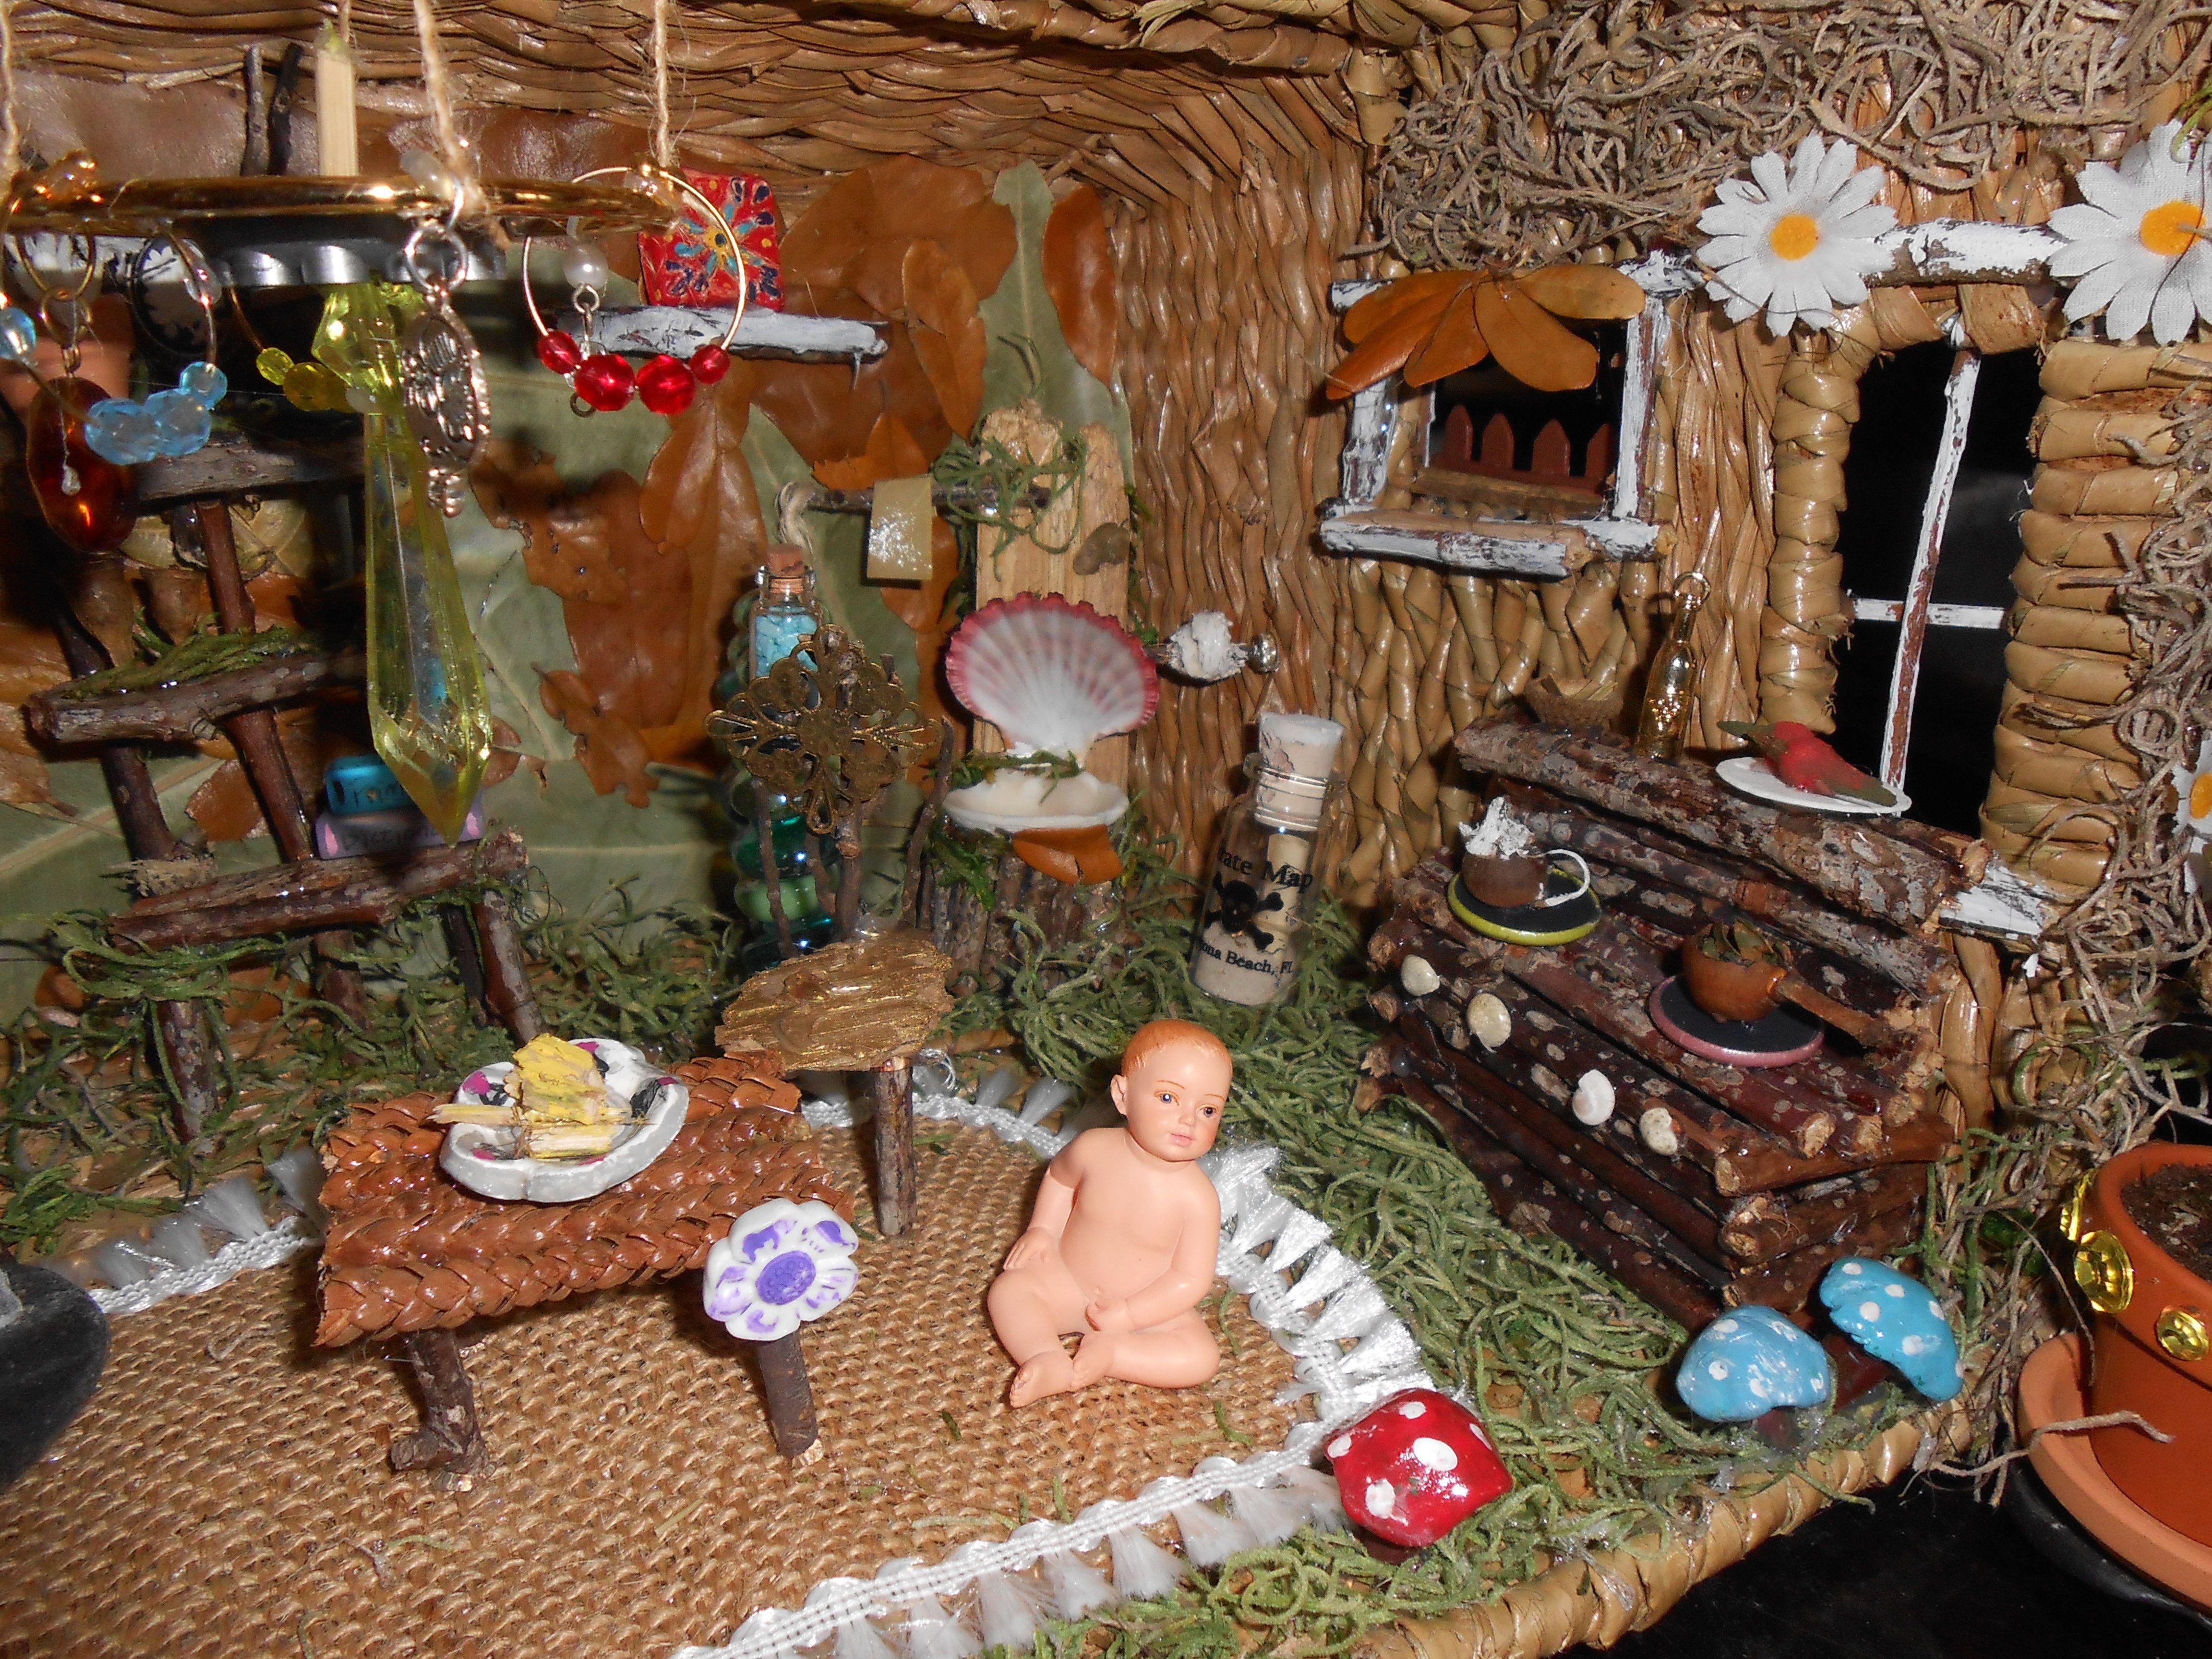 my pictures | miniature garden | Pinterest | Miniature gardens and ...